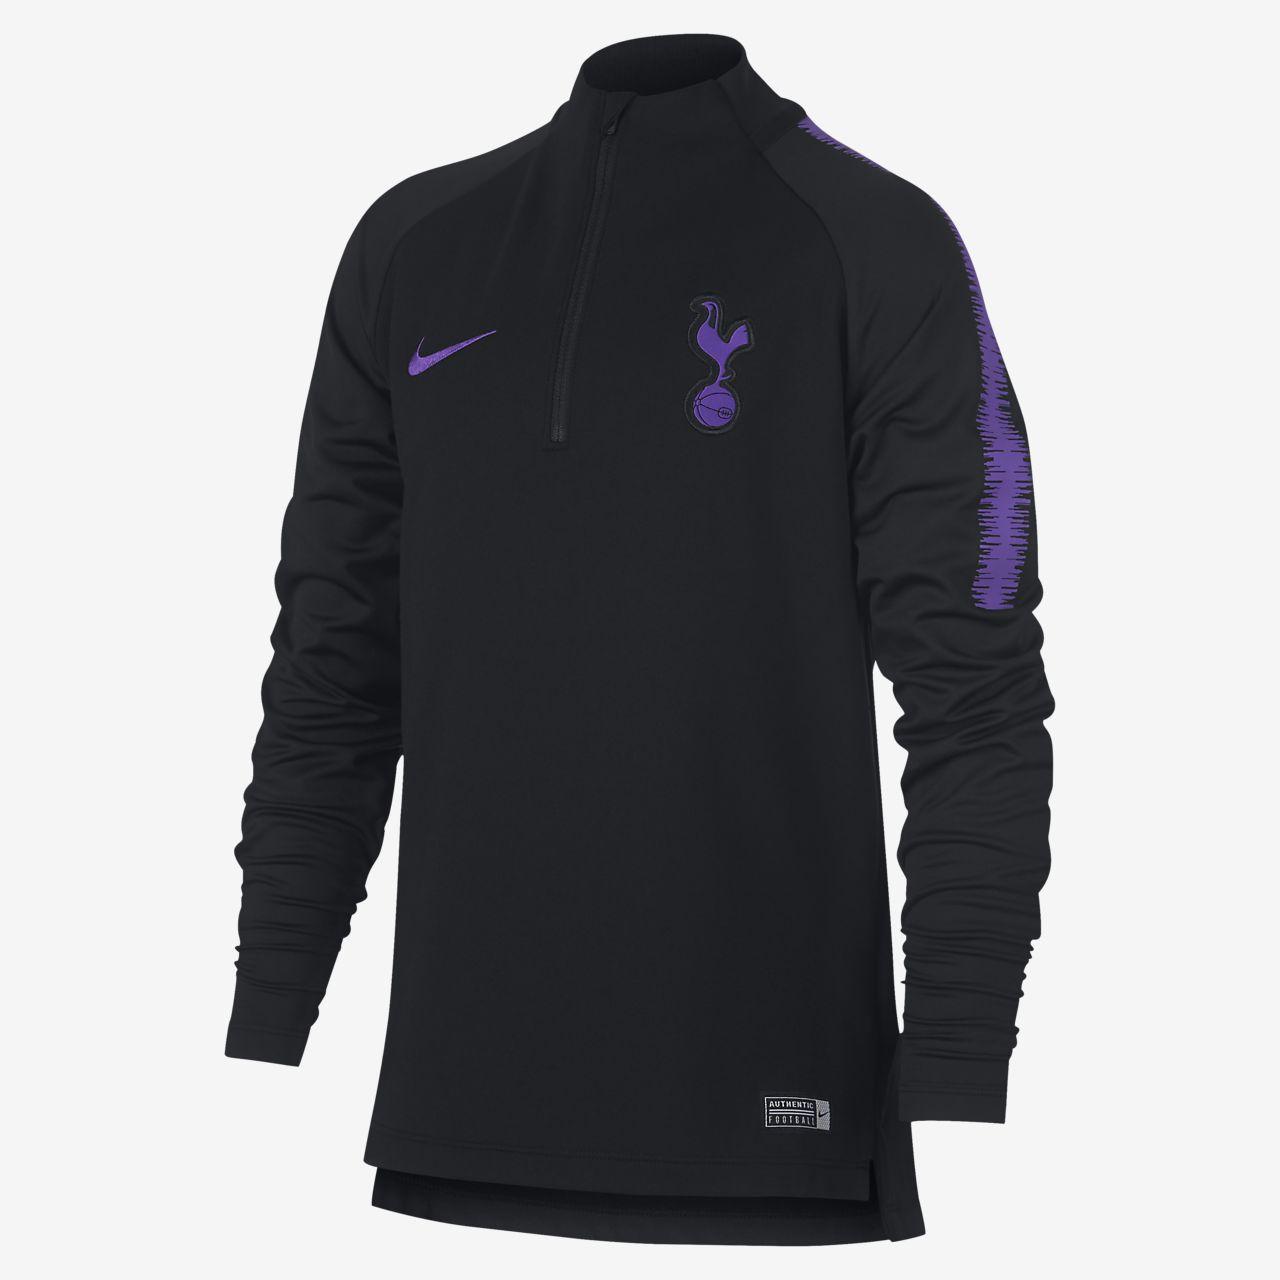 comprar camiseta Tottenham Hotspur manga larga